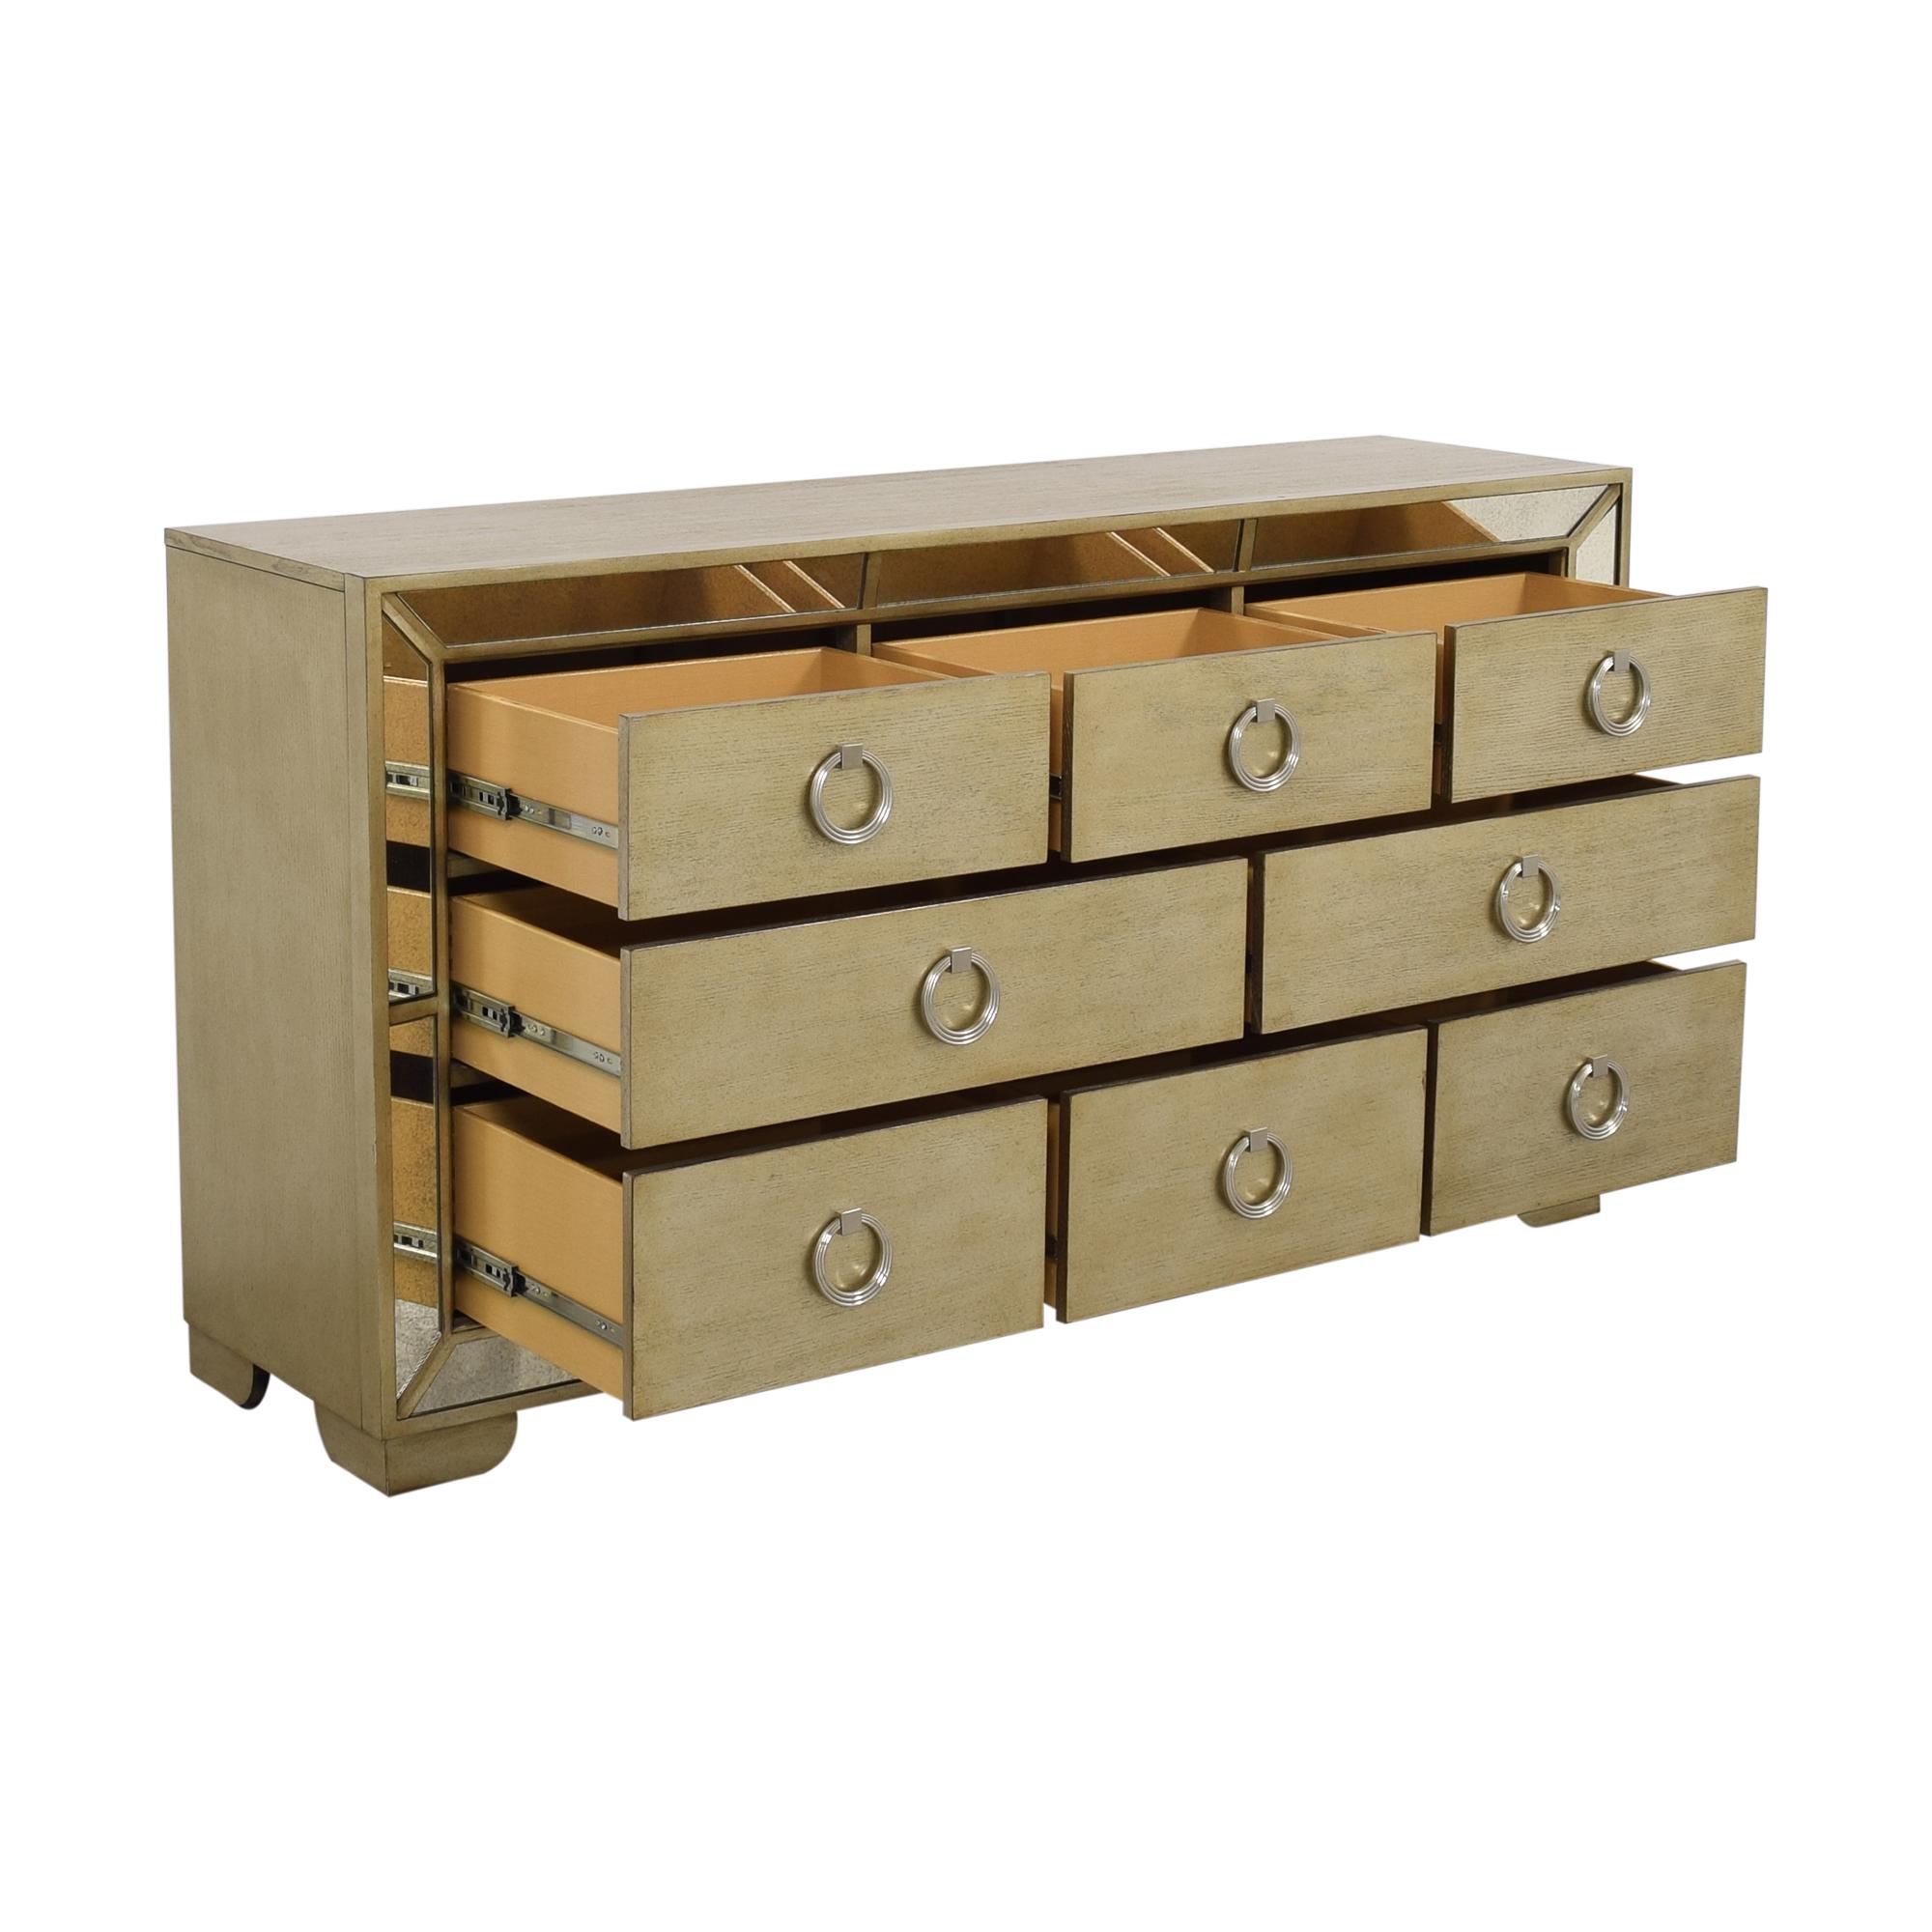 Macy's Macy's Ailey Eight Drawer Dresser on sale